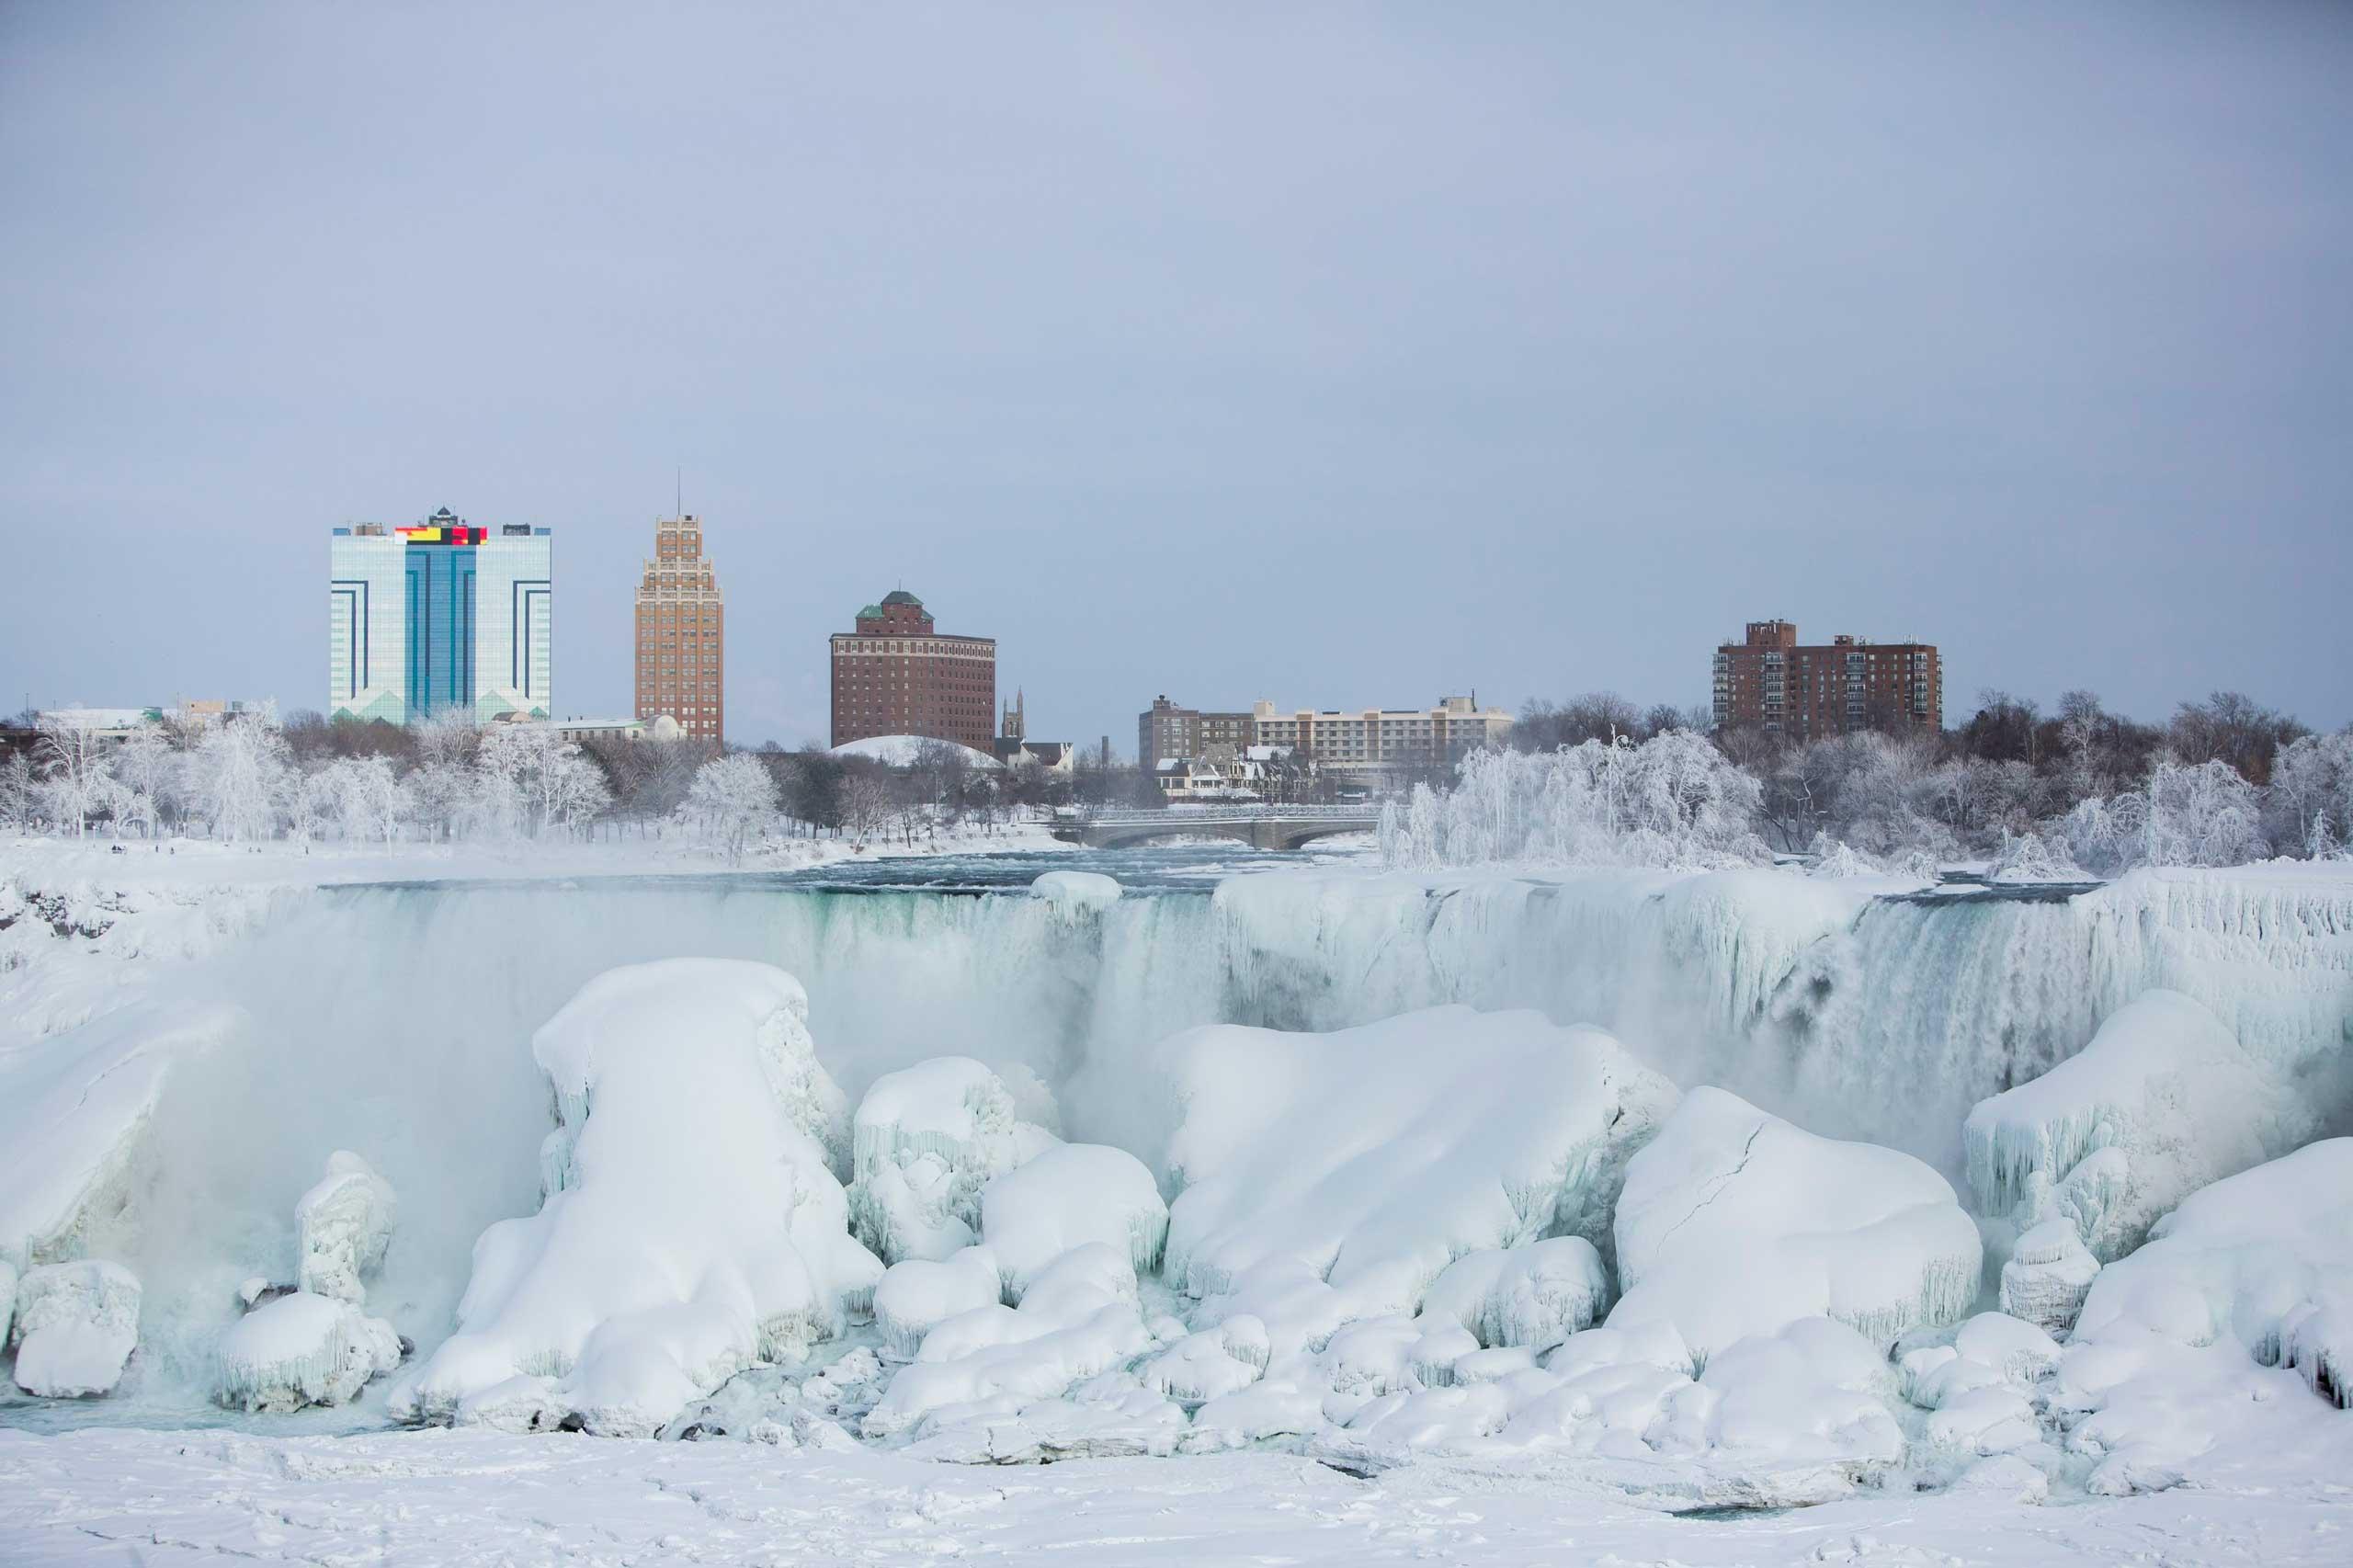 A partially frozen American Falls in sub freezing temperatures is seen in Niagara Falls, Ontario, Canada, Feb. 17, 2015.